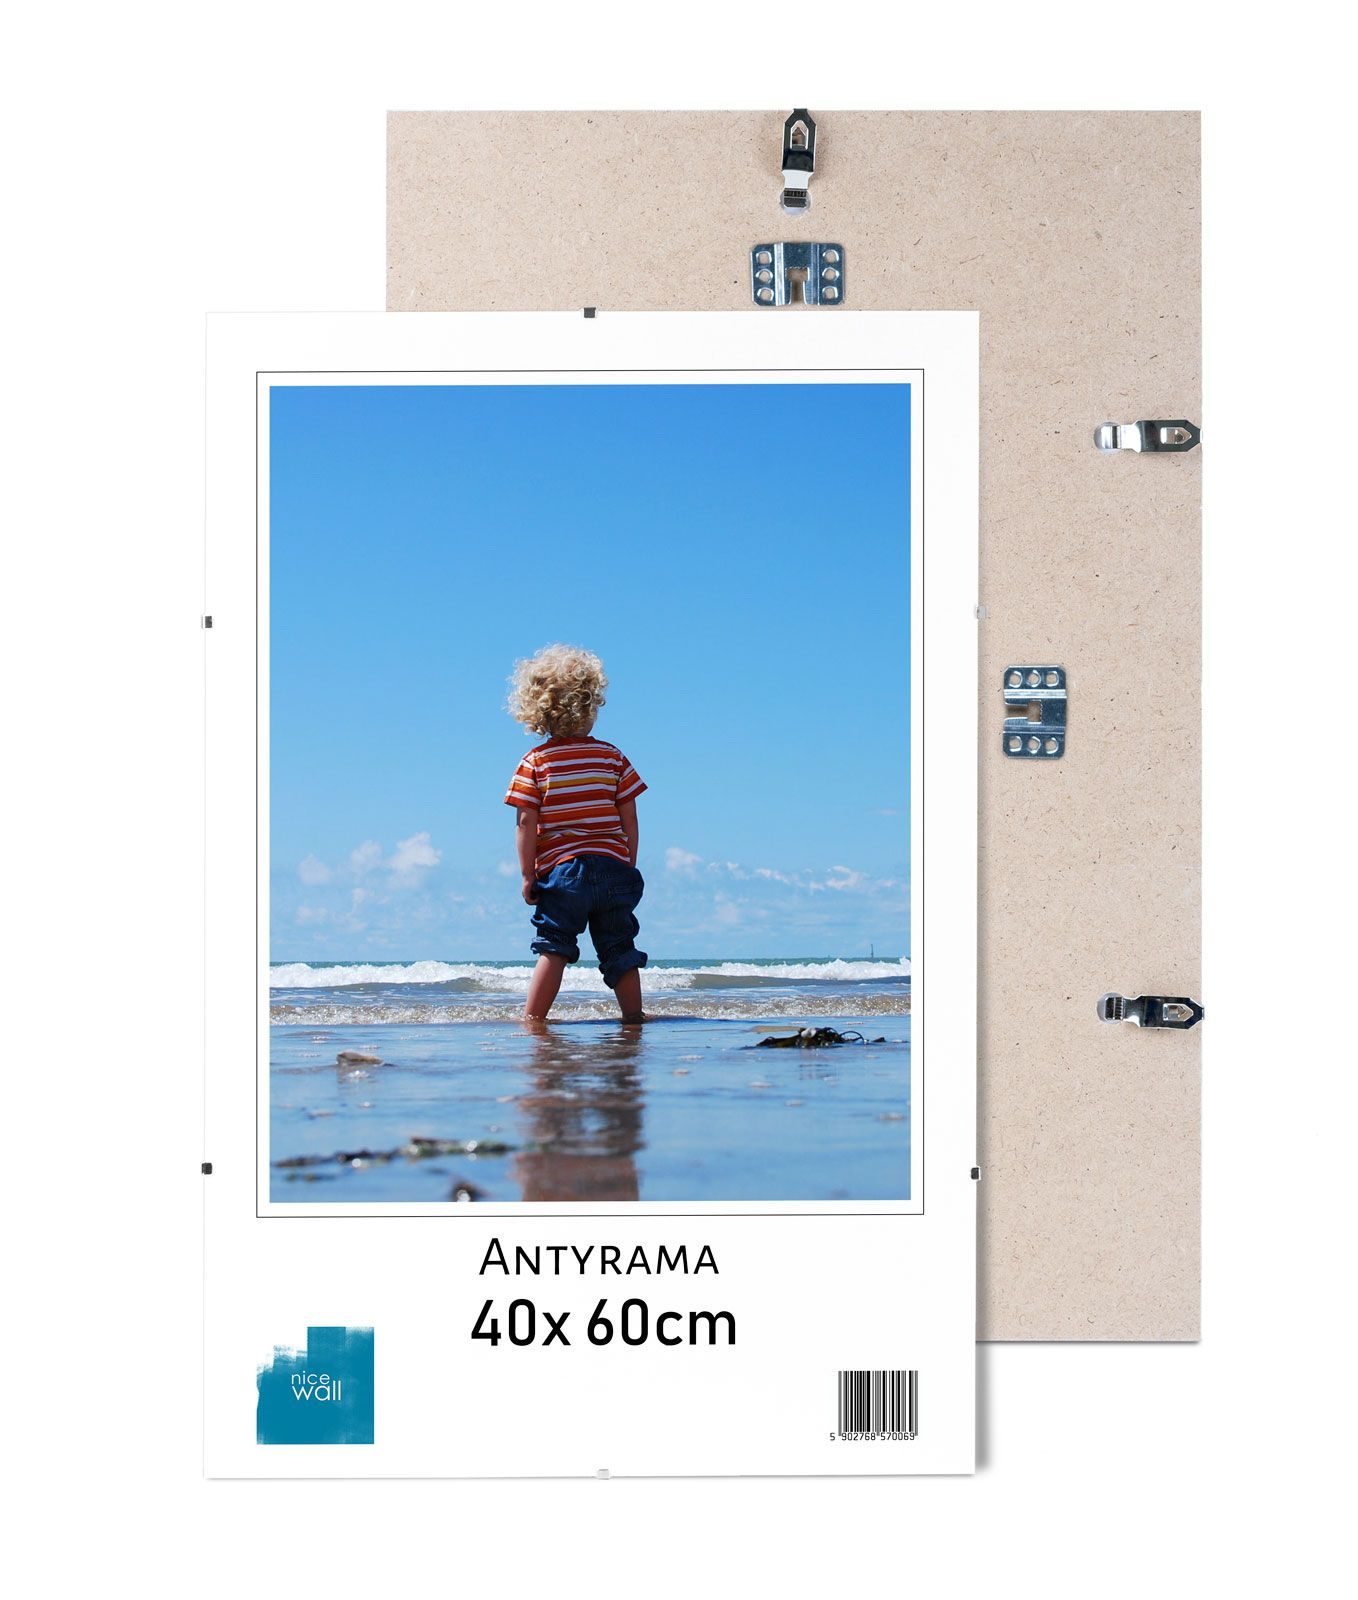 Antiramace 40x60cm Anti-Arm 60x40cm fotorámček